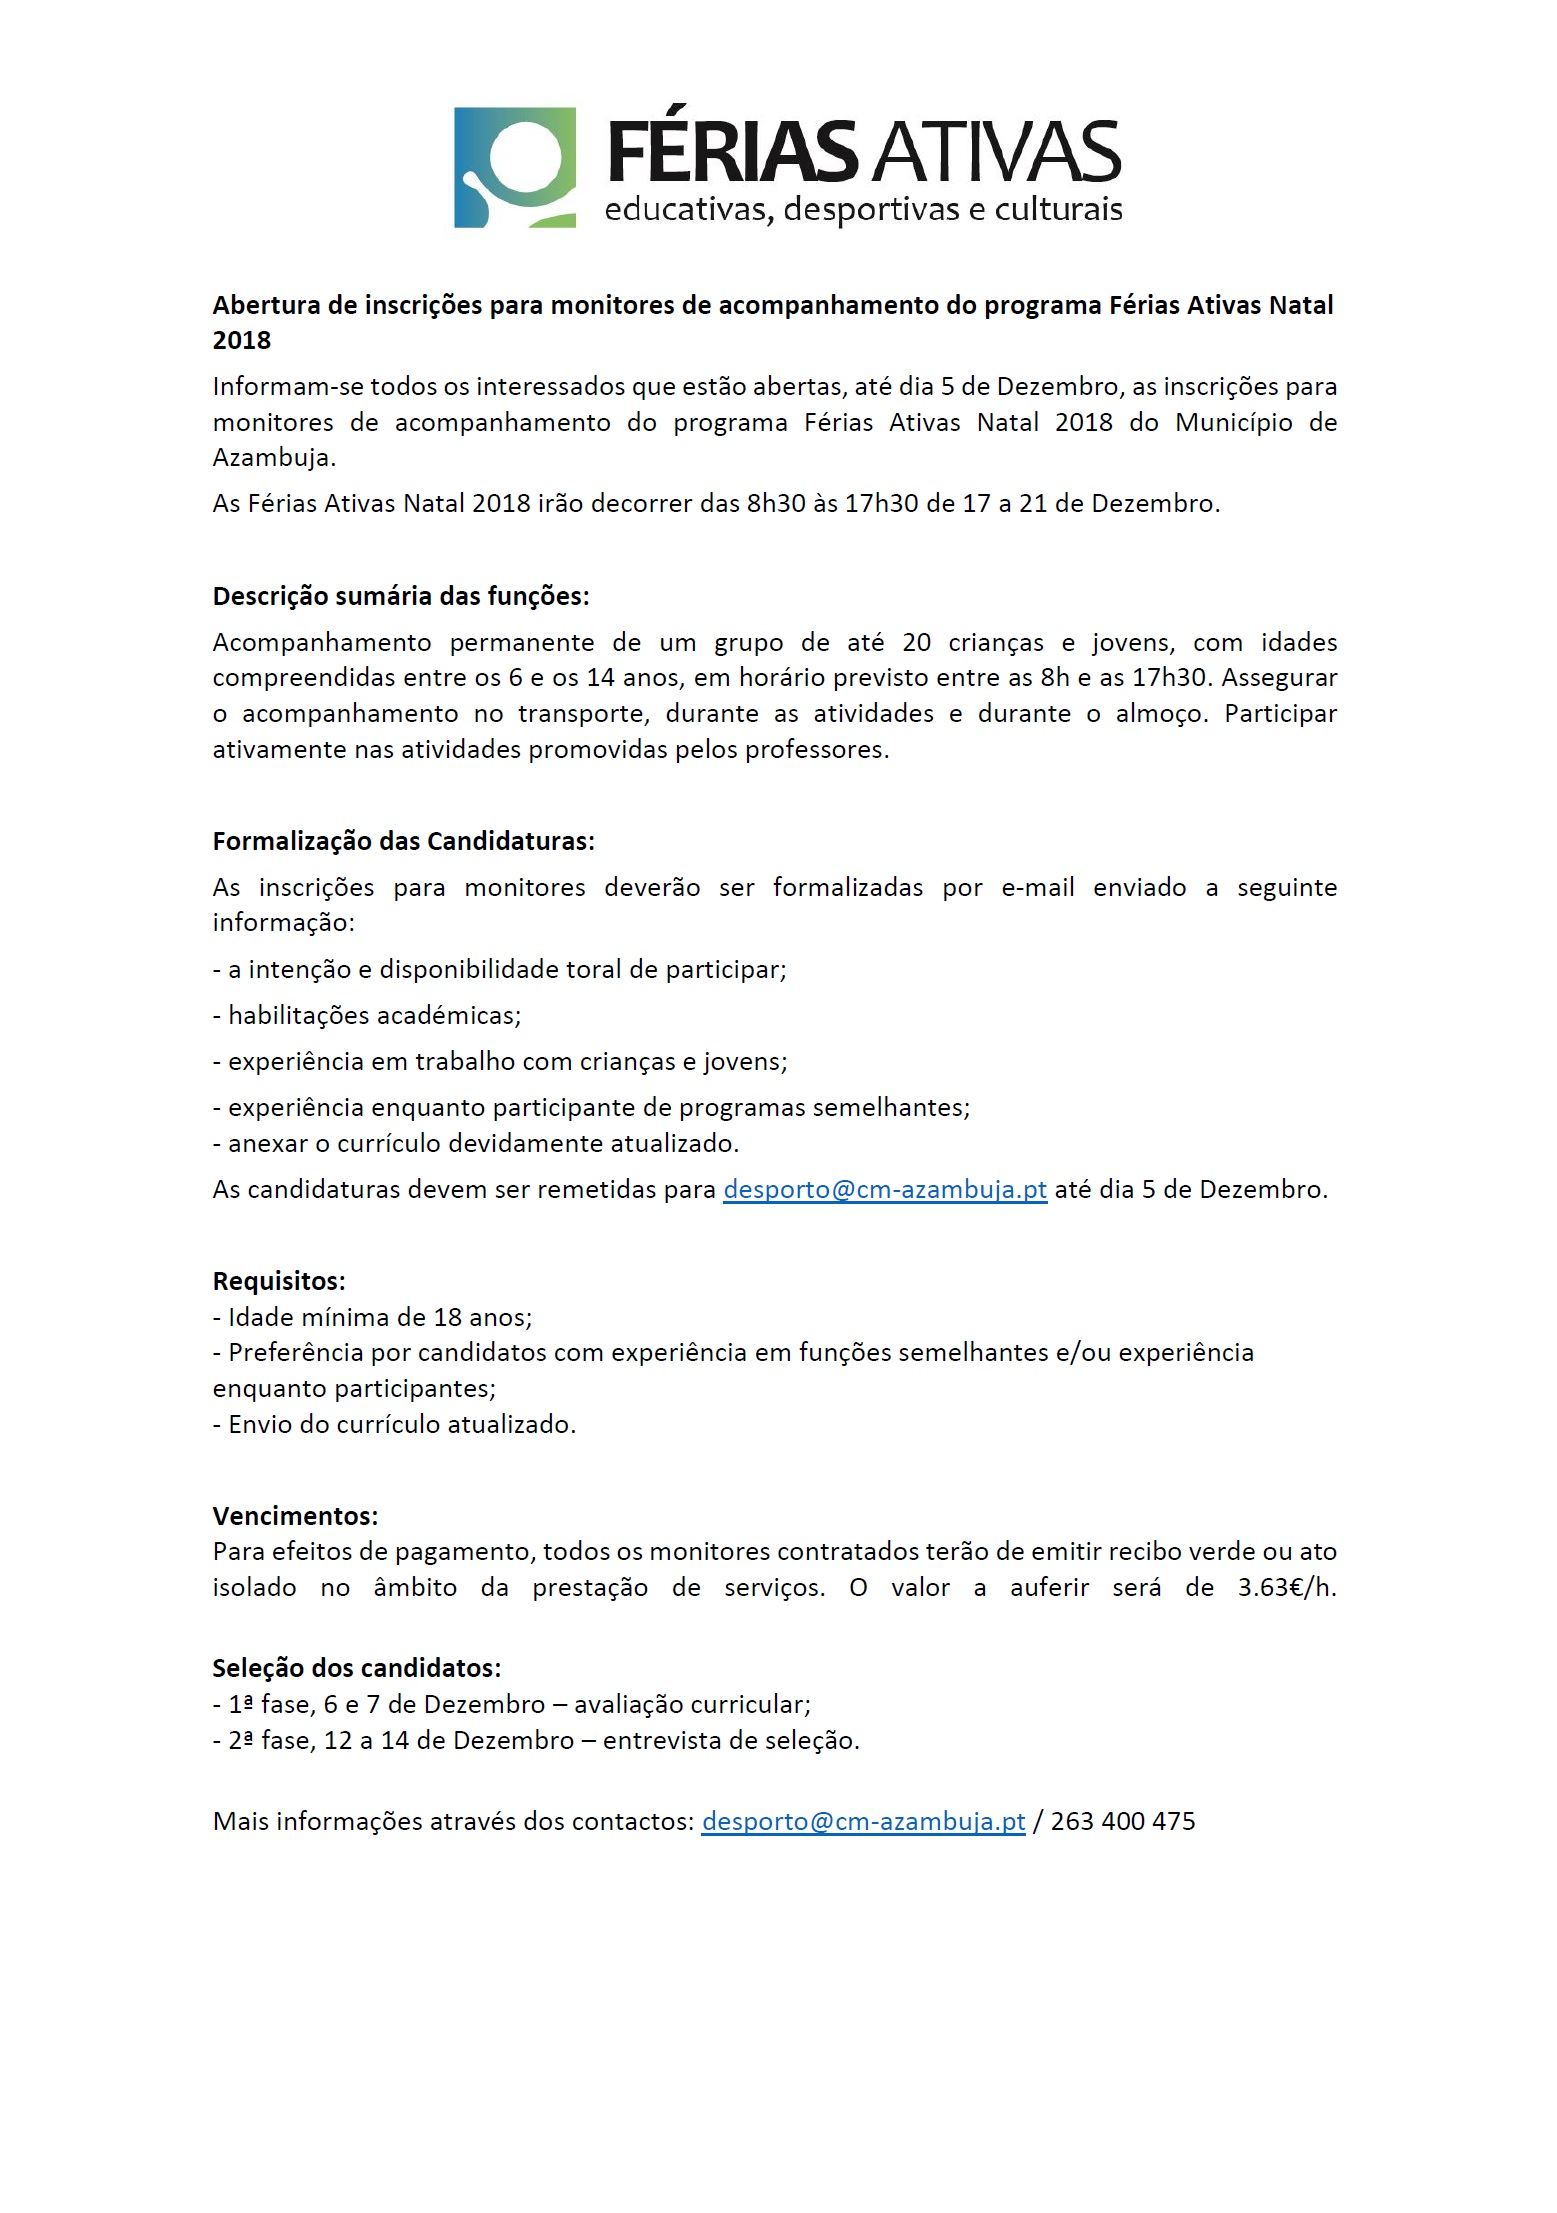 Monitores_Ferias_Ativas_Natal_2018